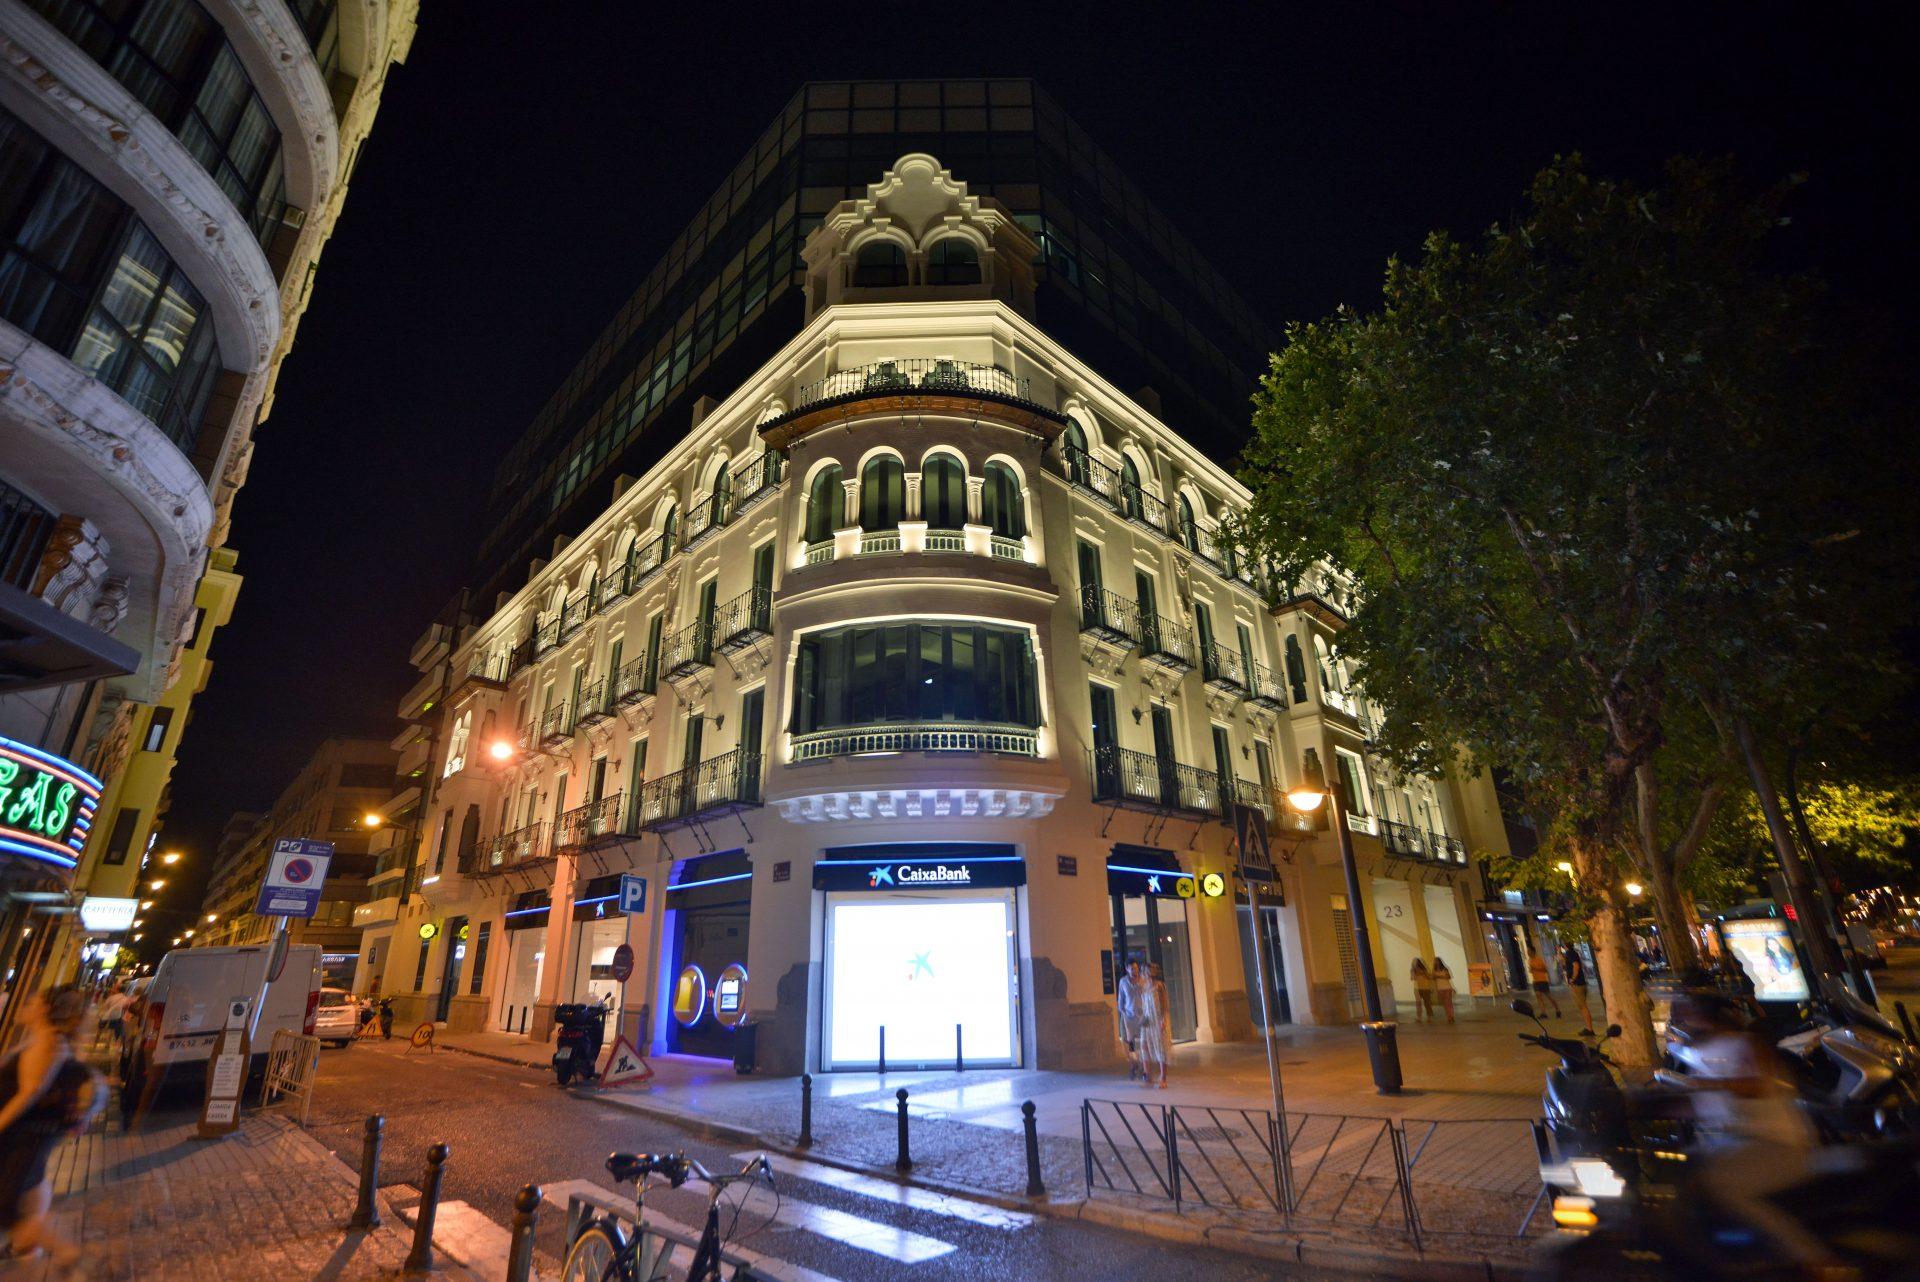 Fachada iluminada de noche de edificio singular para Caixabank en el centro de Córdoba